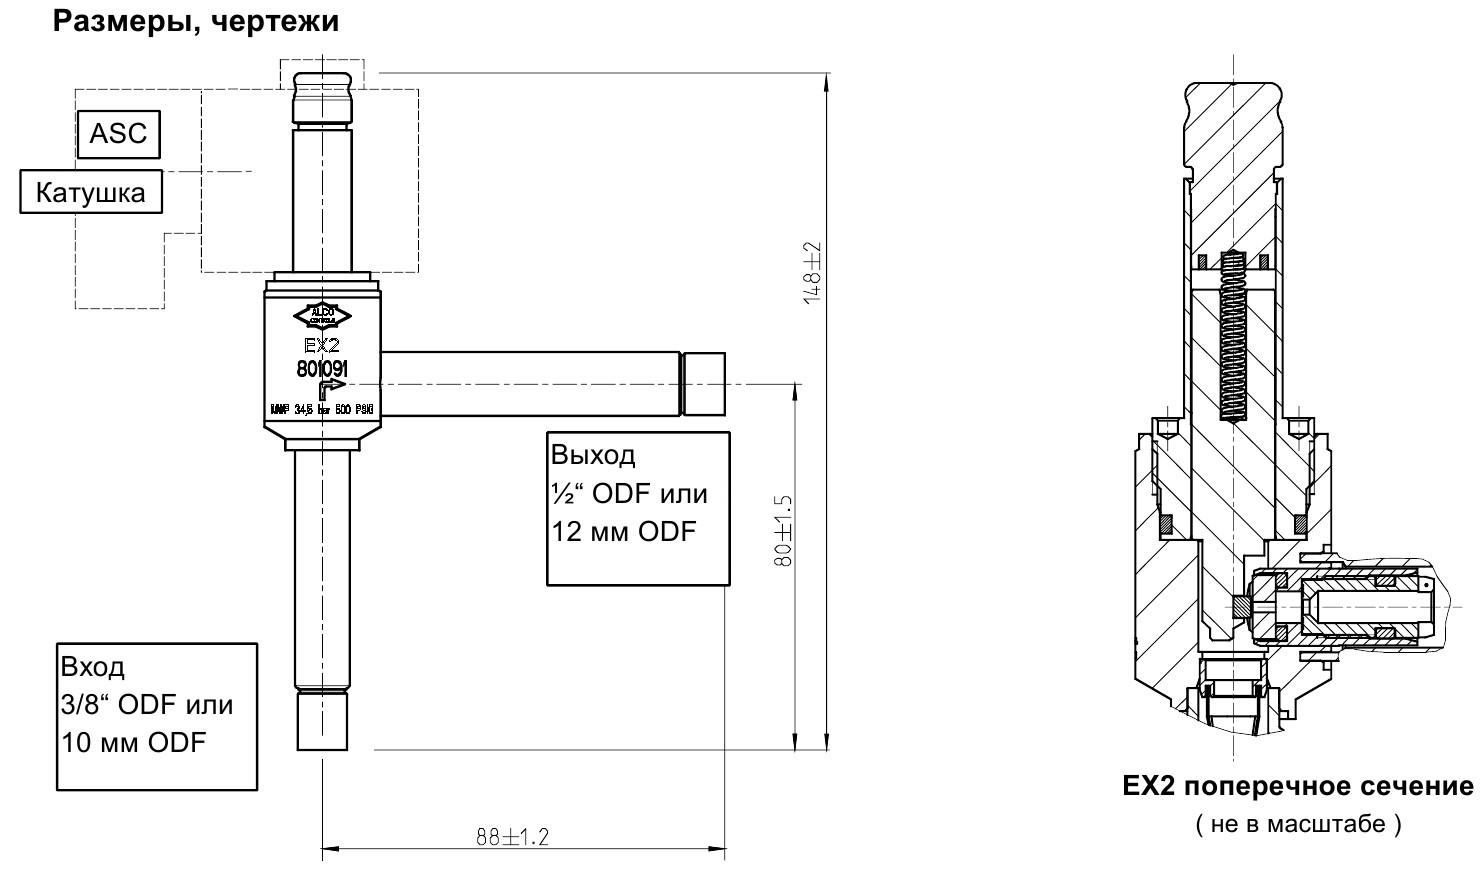 Alco controls EX2 - 3